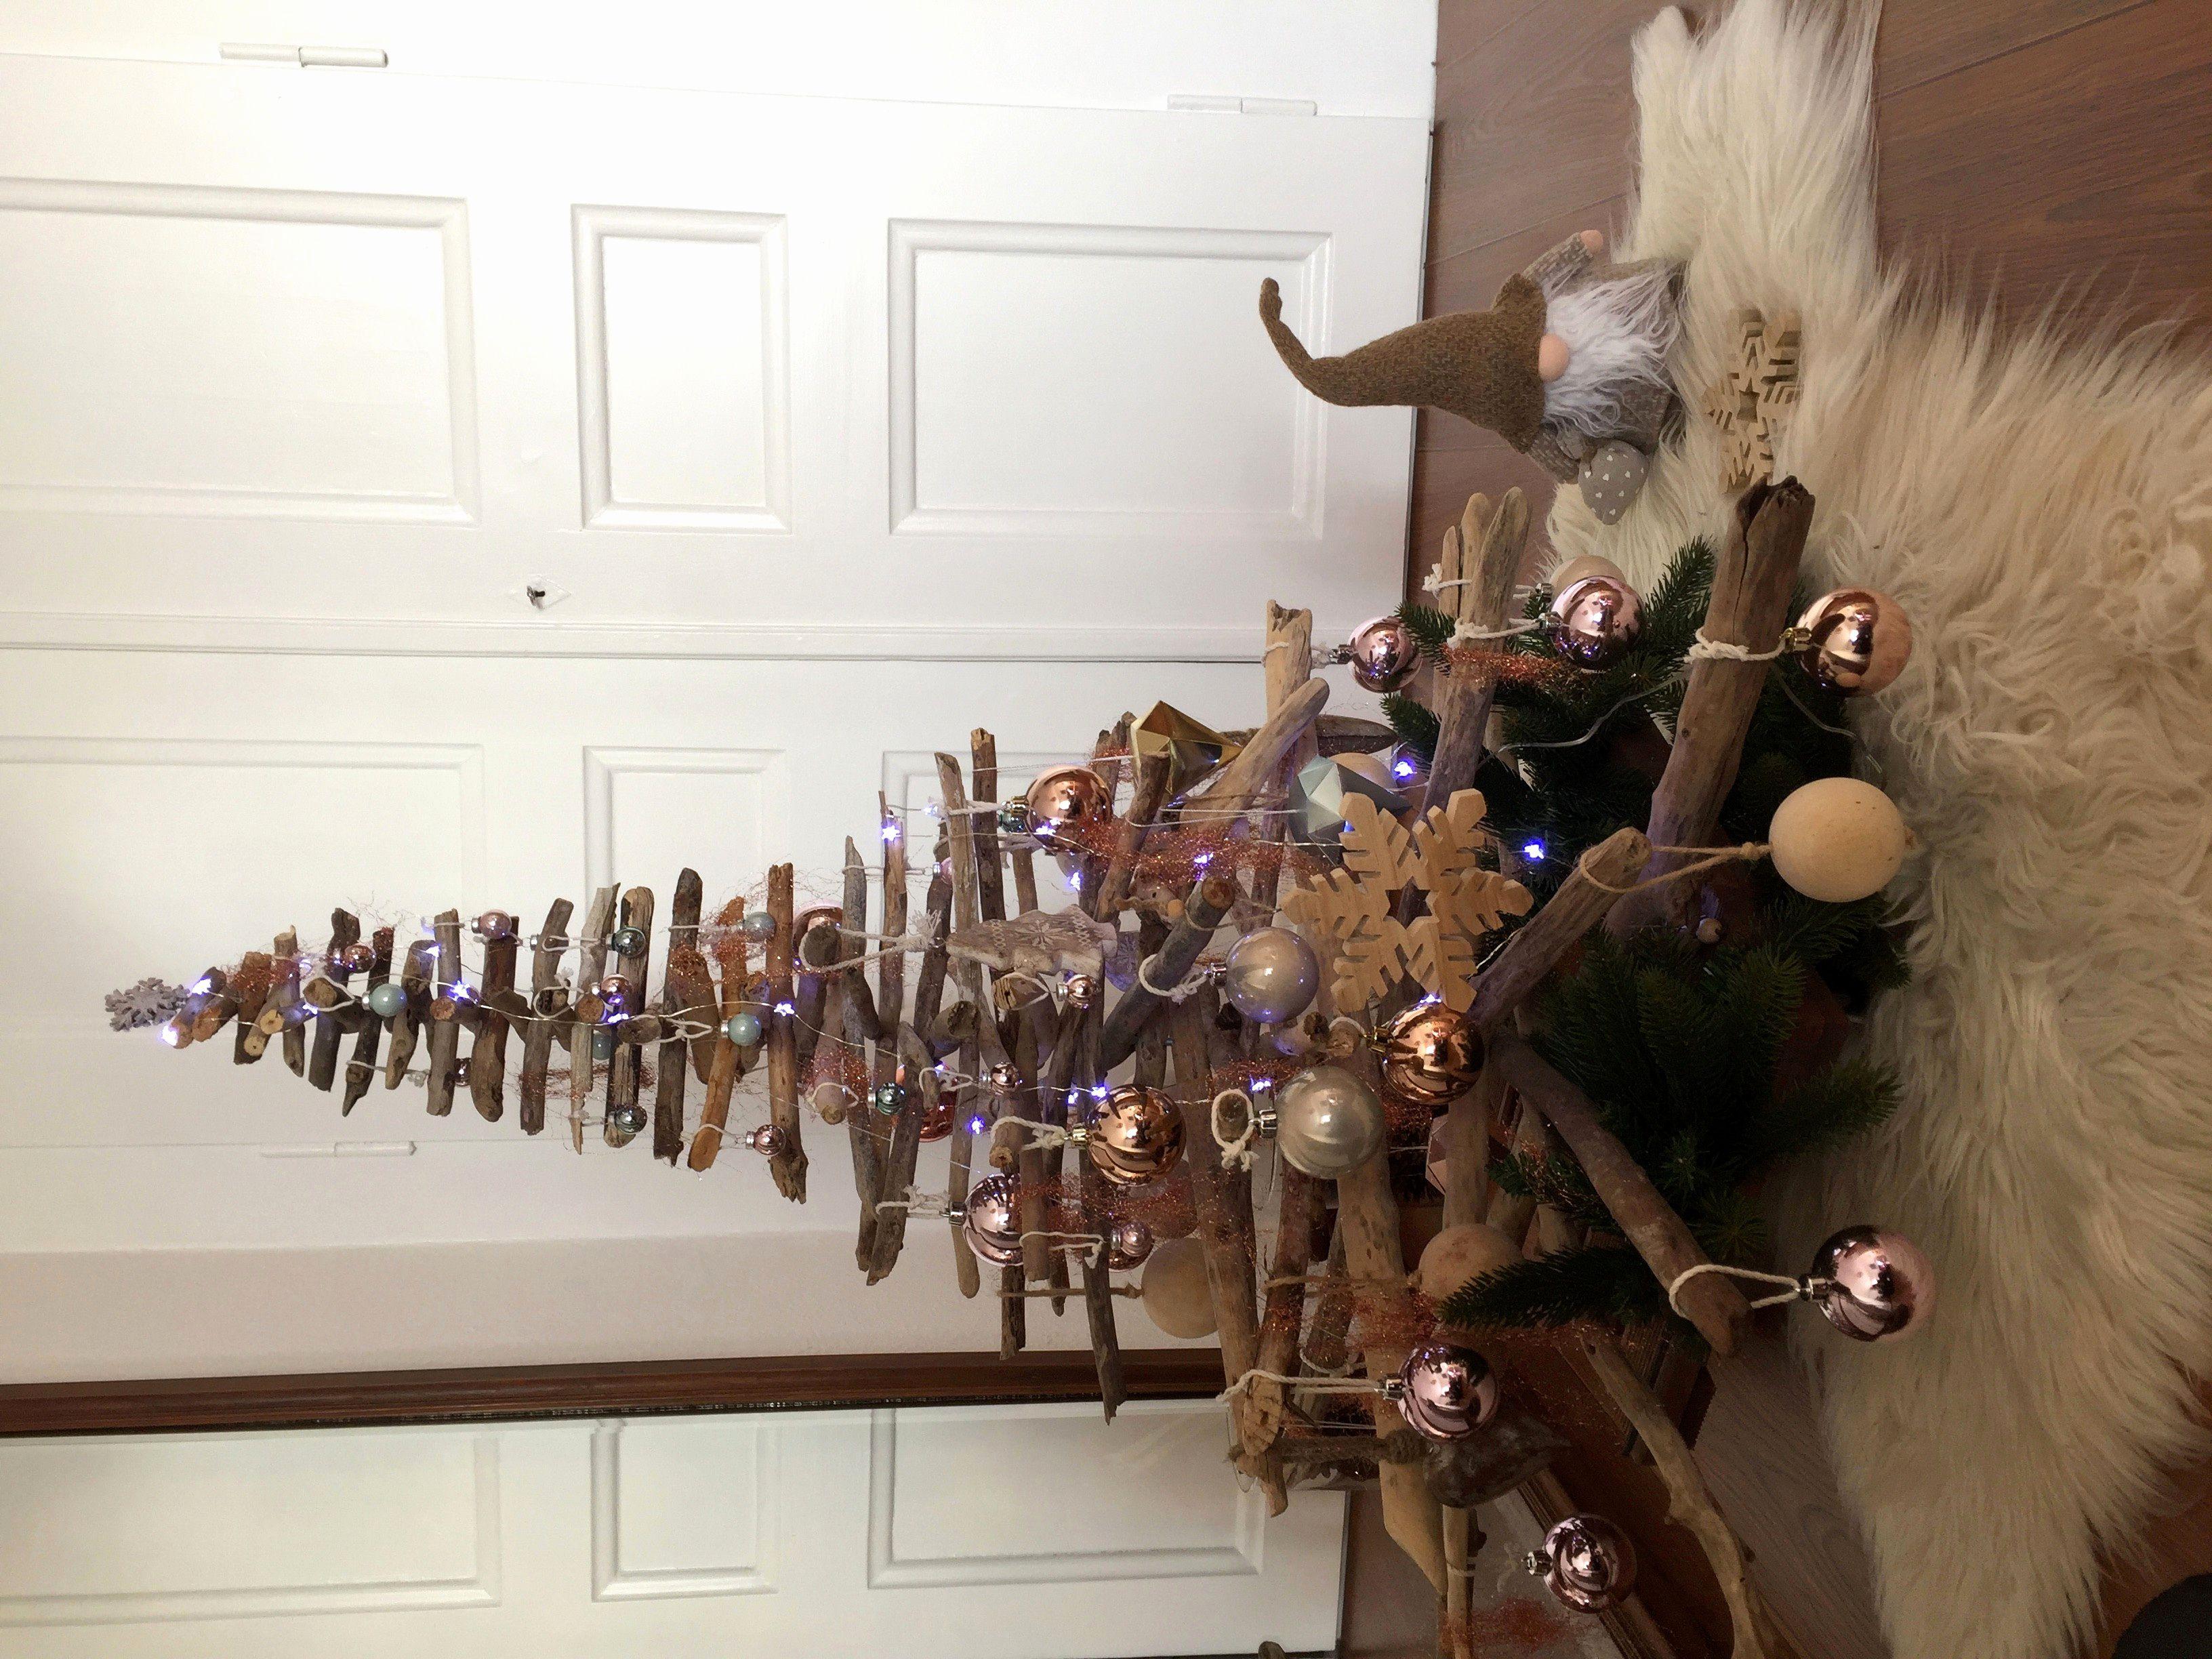 201 Chambre Des Metiers 94 Check More At Https Leonstafford Com Chambre Des Metiers 94 Hanukkah Wreath Christmas Wreaths